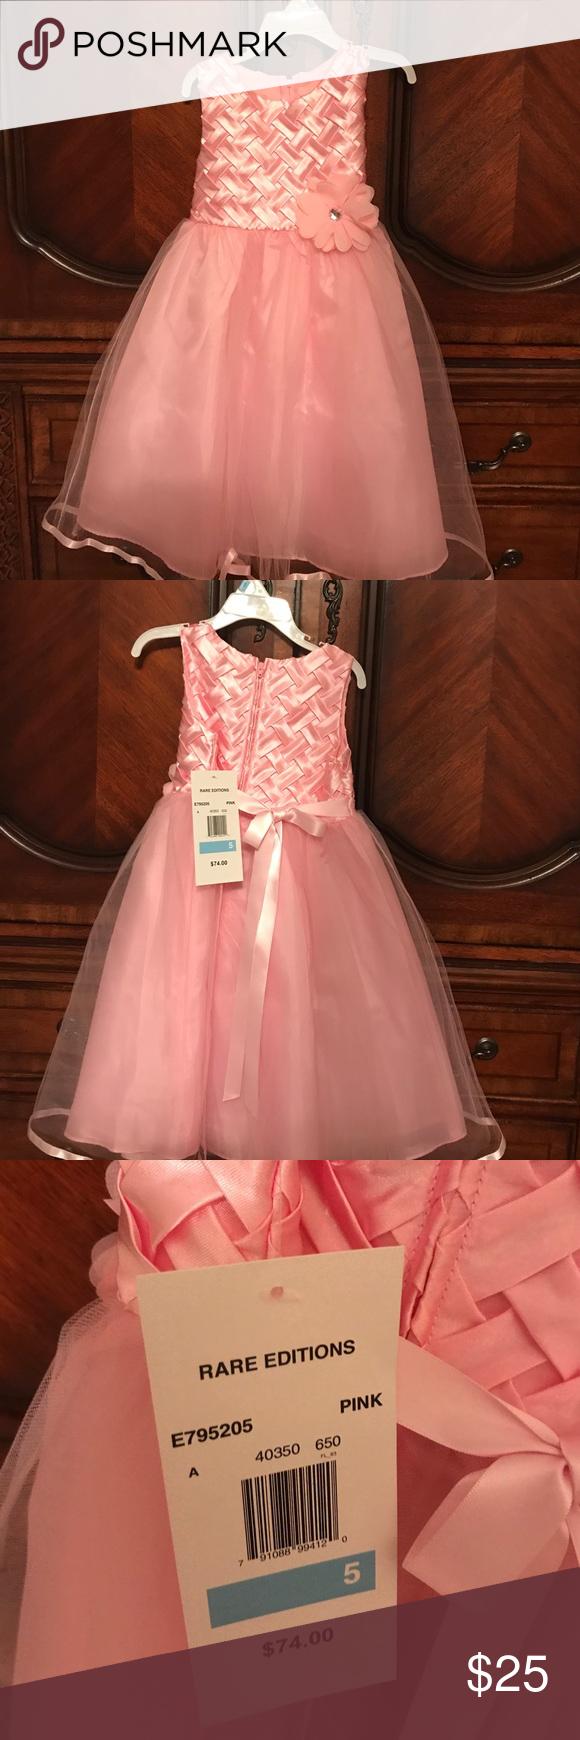 Brandnew formal princess dress pink satin basket weave bodice